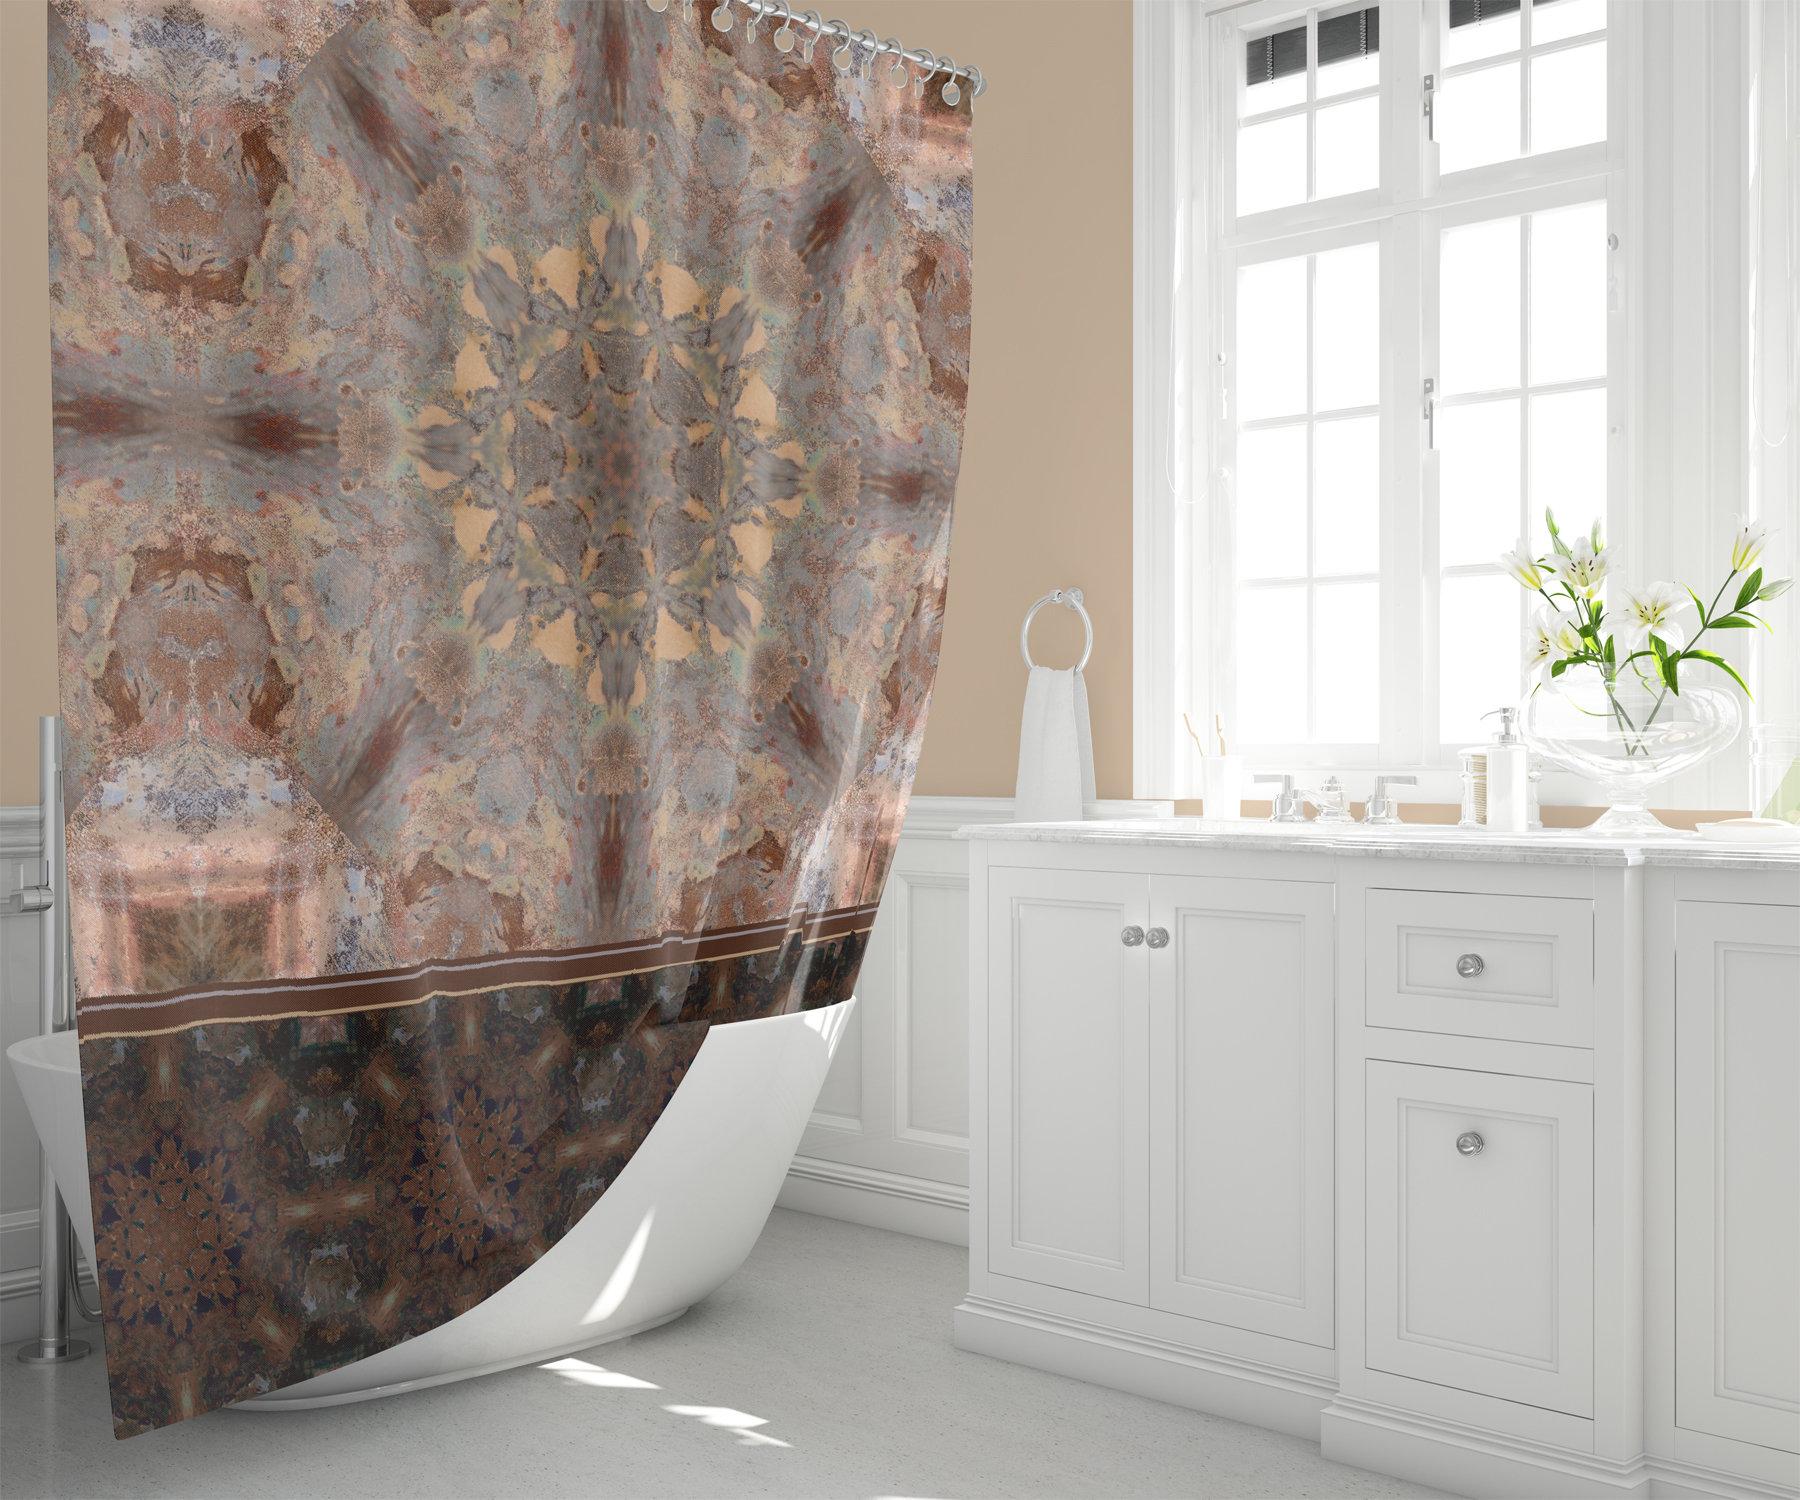 Boho Copper Mandala Shower Curtain Brown And Caramel Zen Bathroom Decor